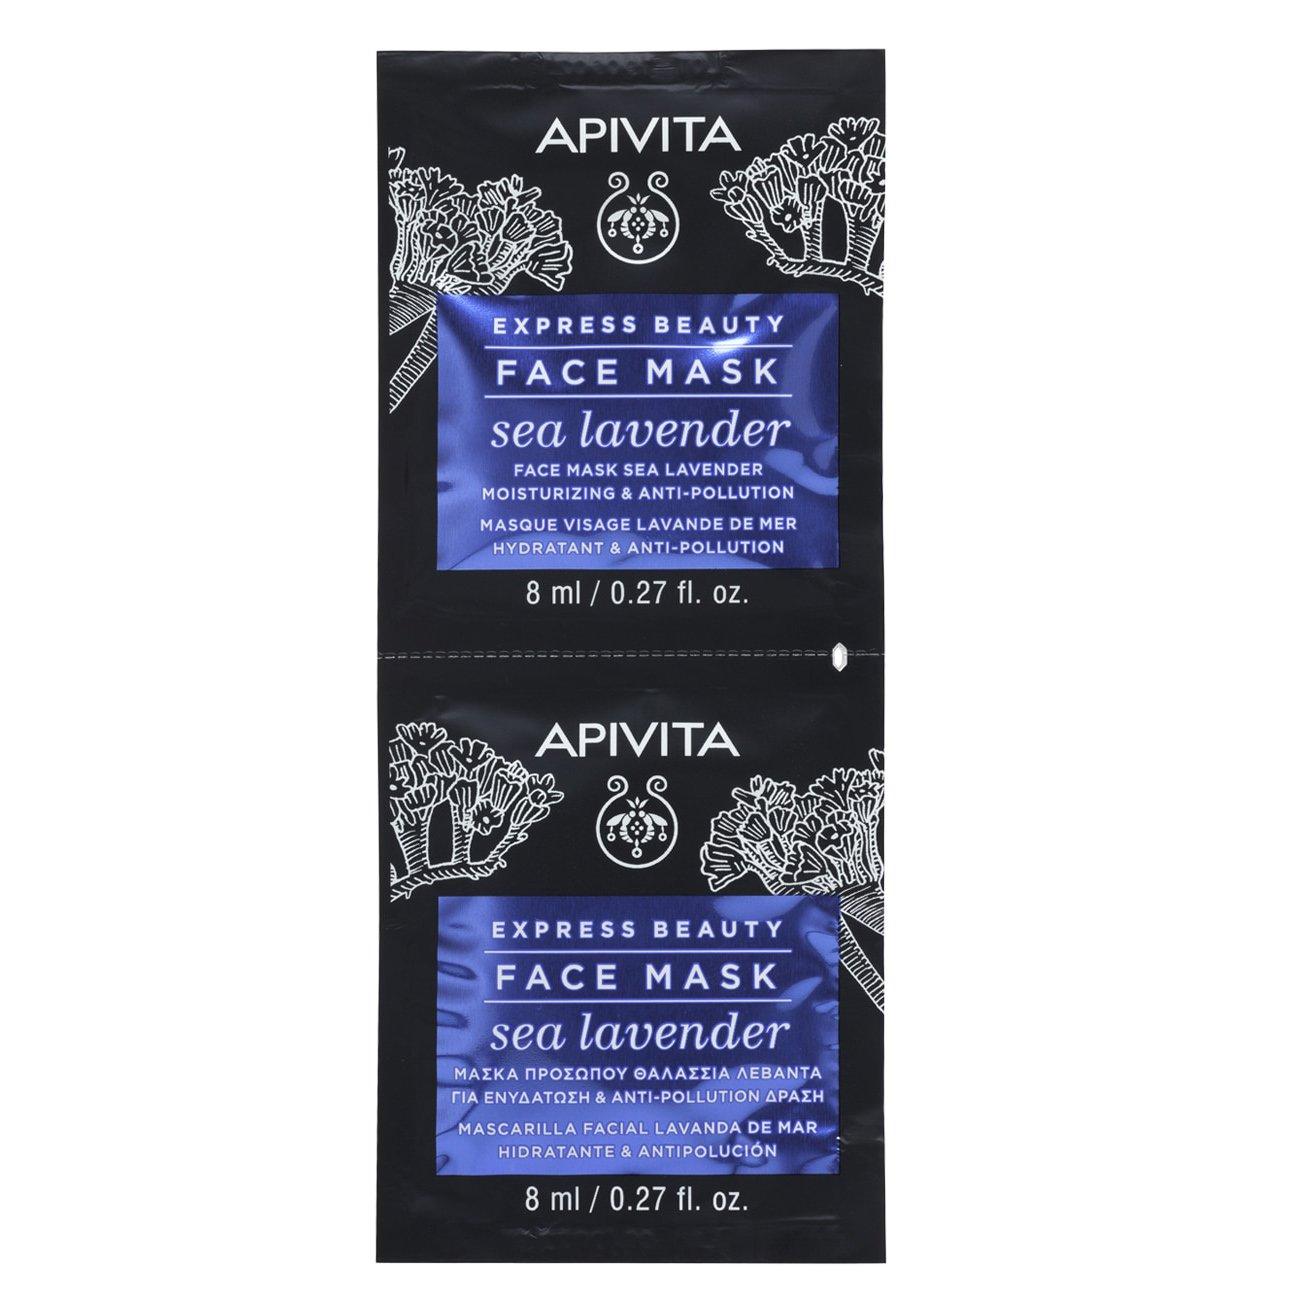 Apivita Express Beauty Μάσκα Ενυδάτωσης & Αντιοξειδωτικής Προστασίας Με Θαλάσσια Λεβάντα 2x8ml